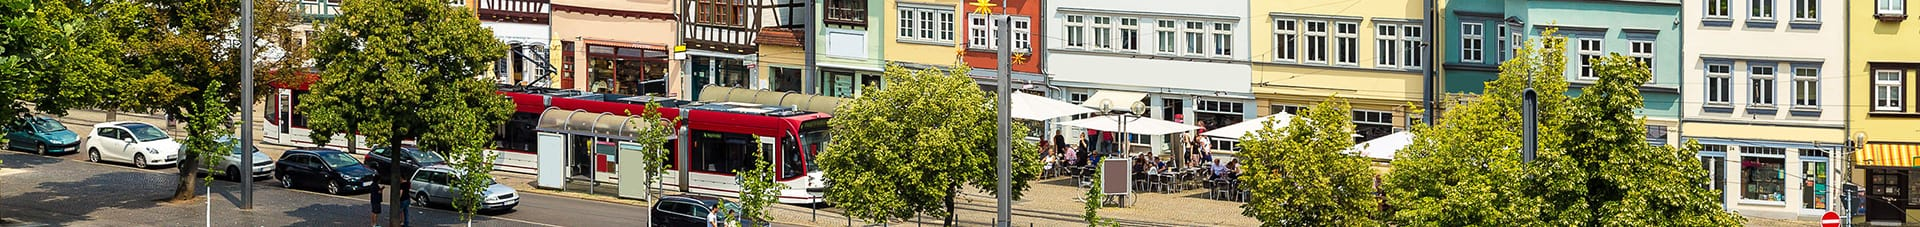 Schütz Zahntechnik Bethmann in Erfurt.